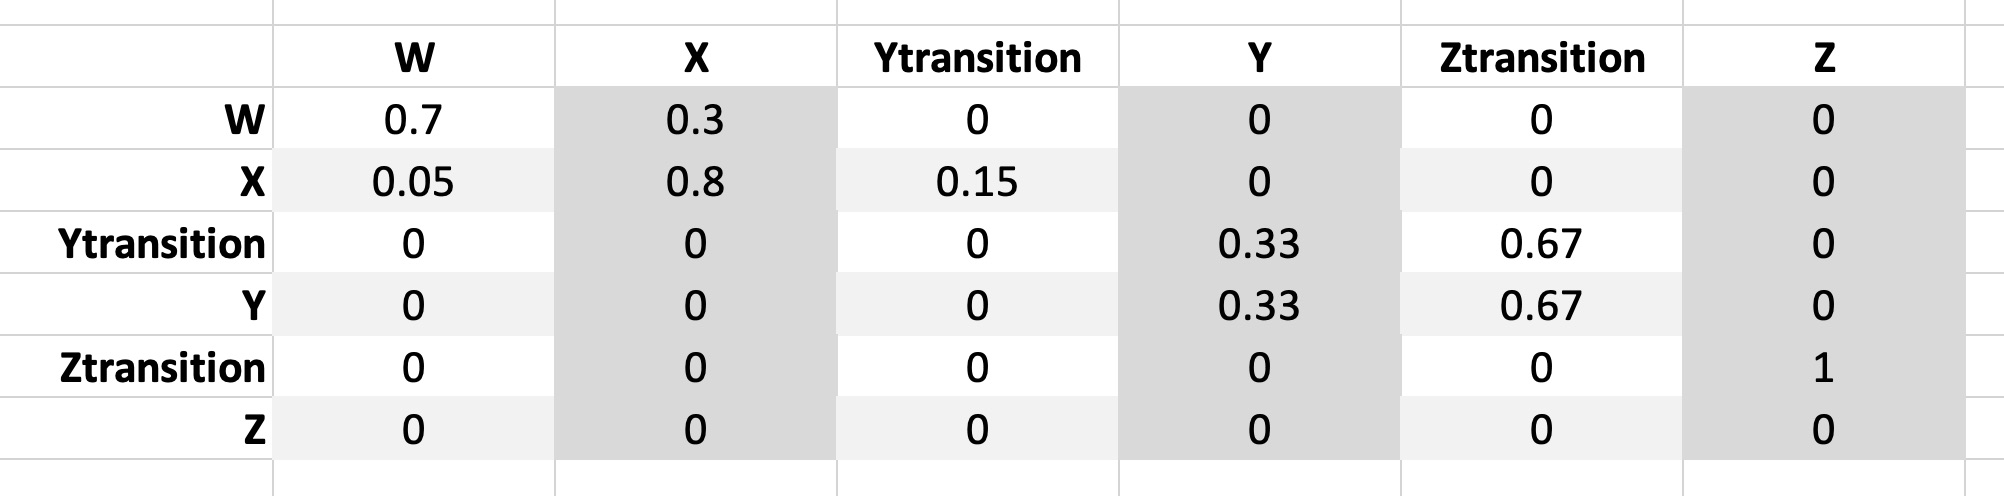 A screenshot of a transition matrix built in Excel